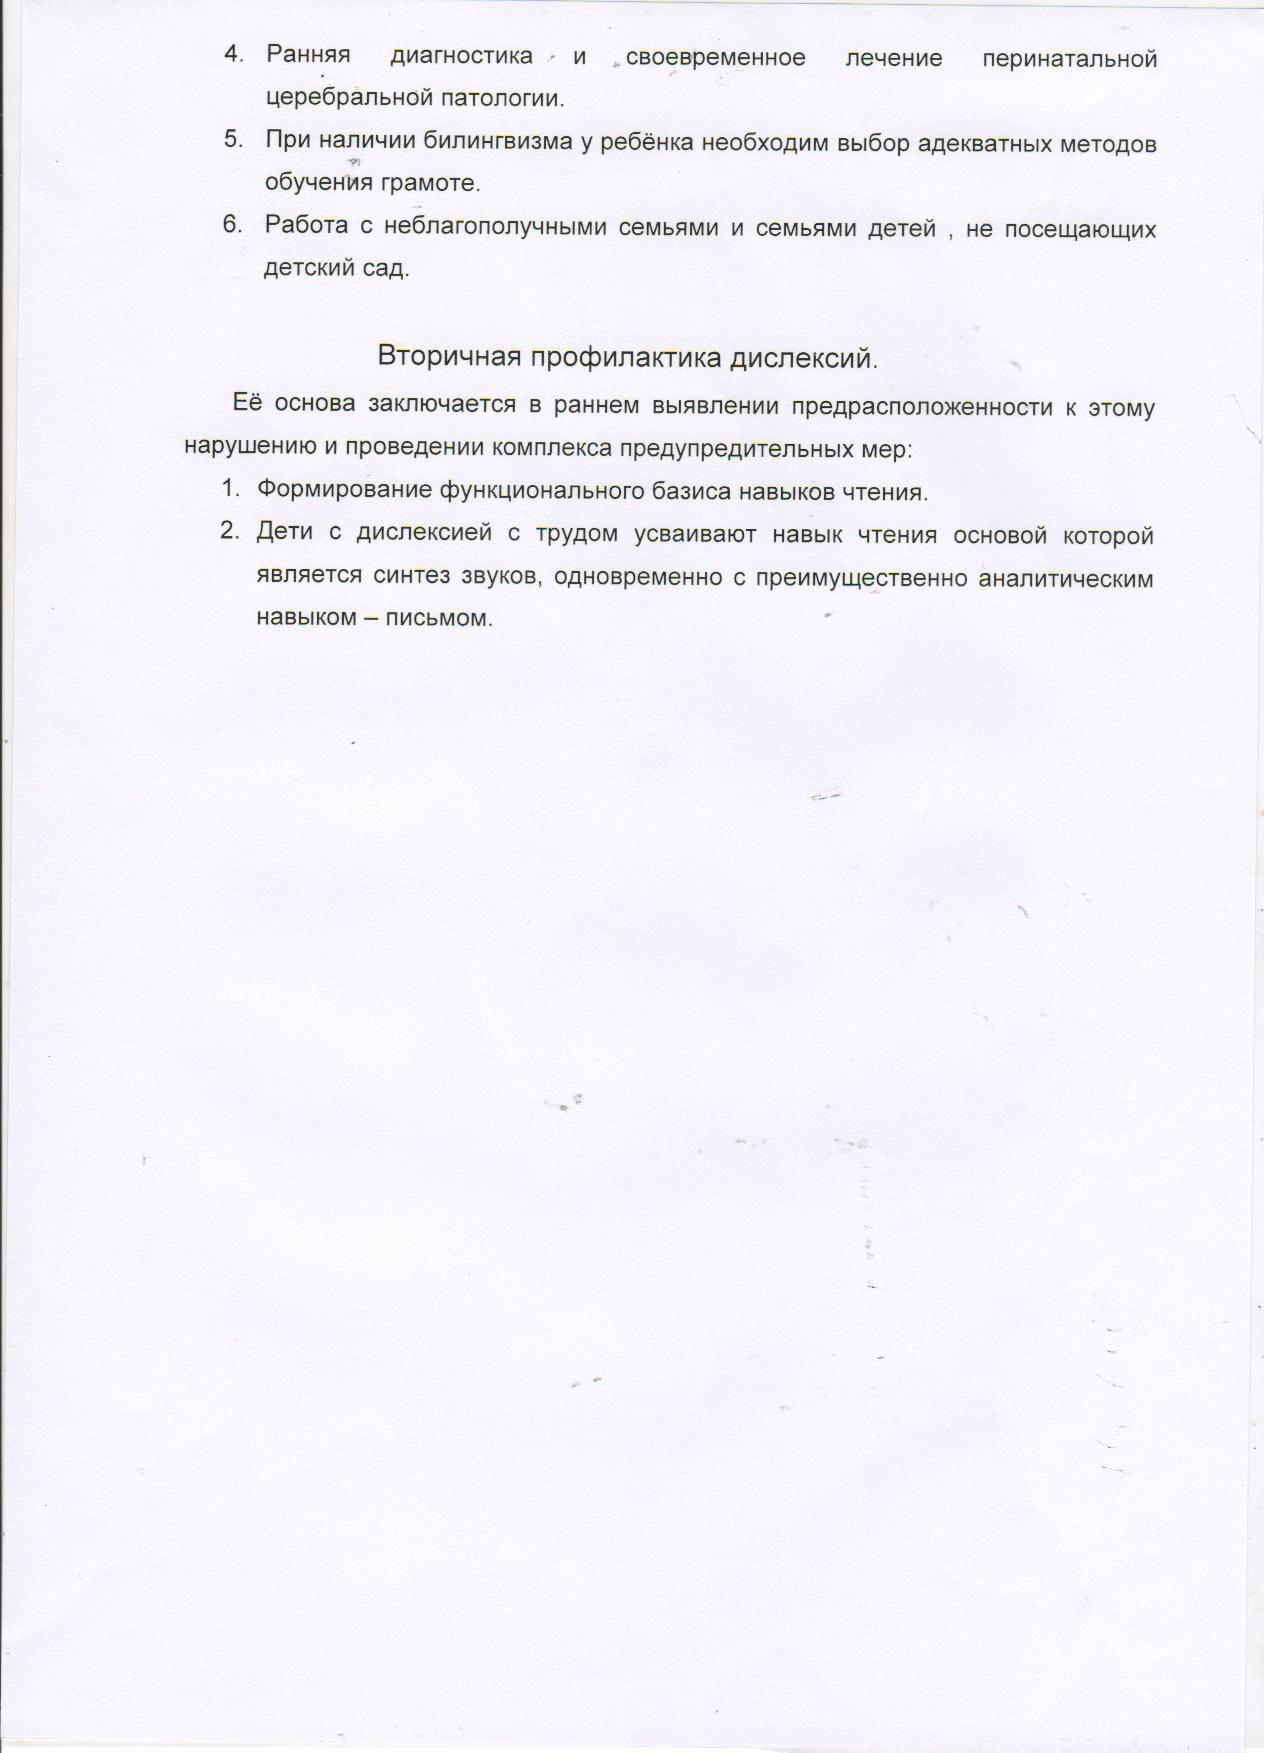 C:\Documents and Settings\Администратор\Рабочий стол\Тептякова Е.А. 012.jpg